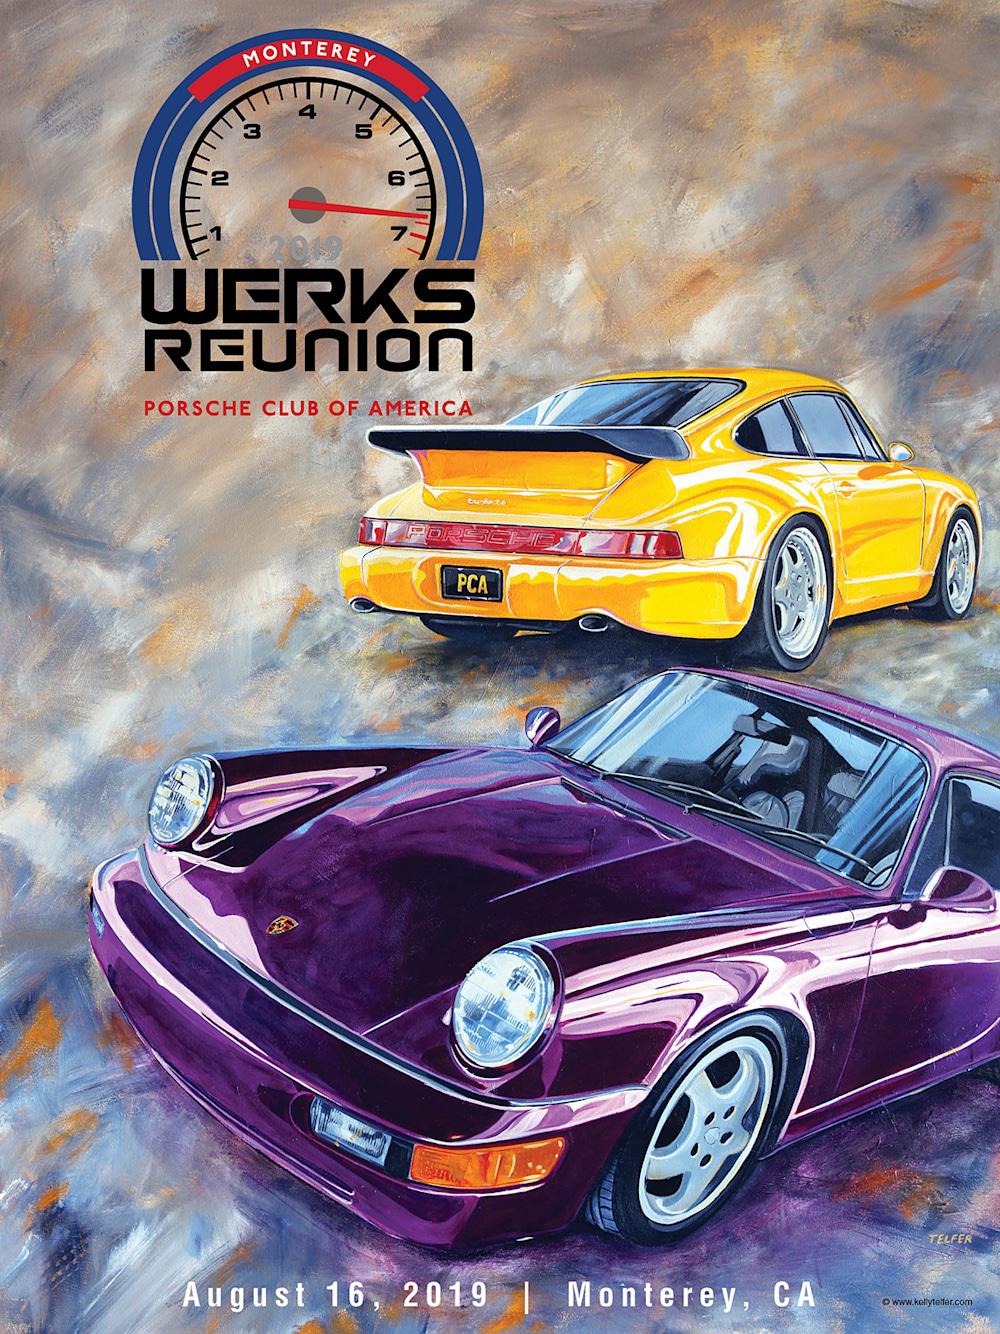 Werks Reunion Poster by Kelly Telfer